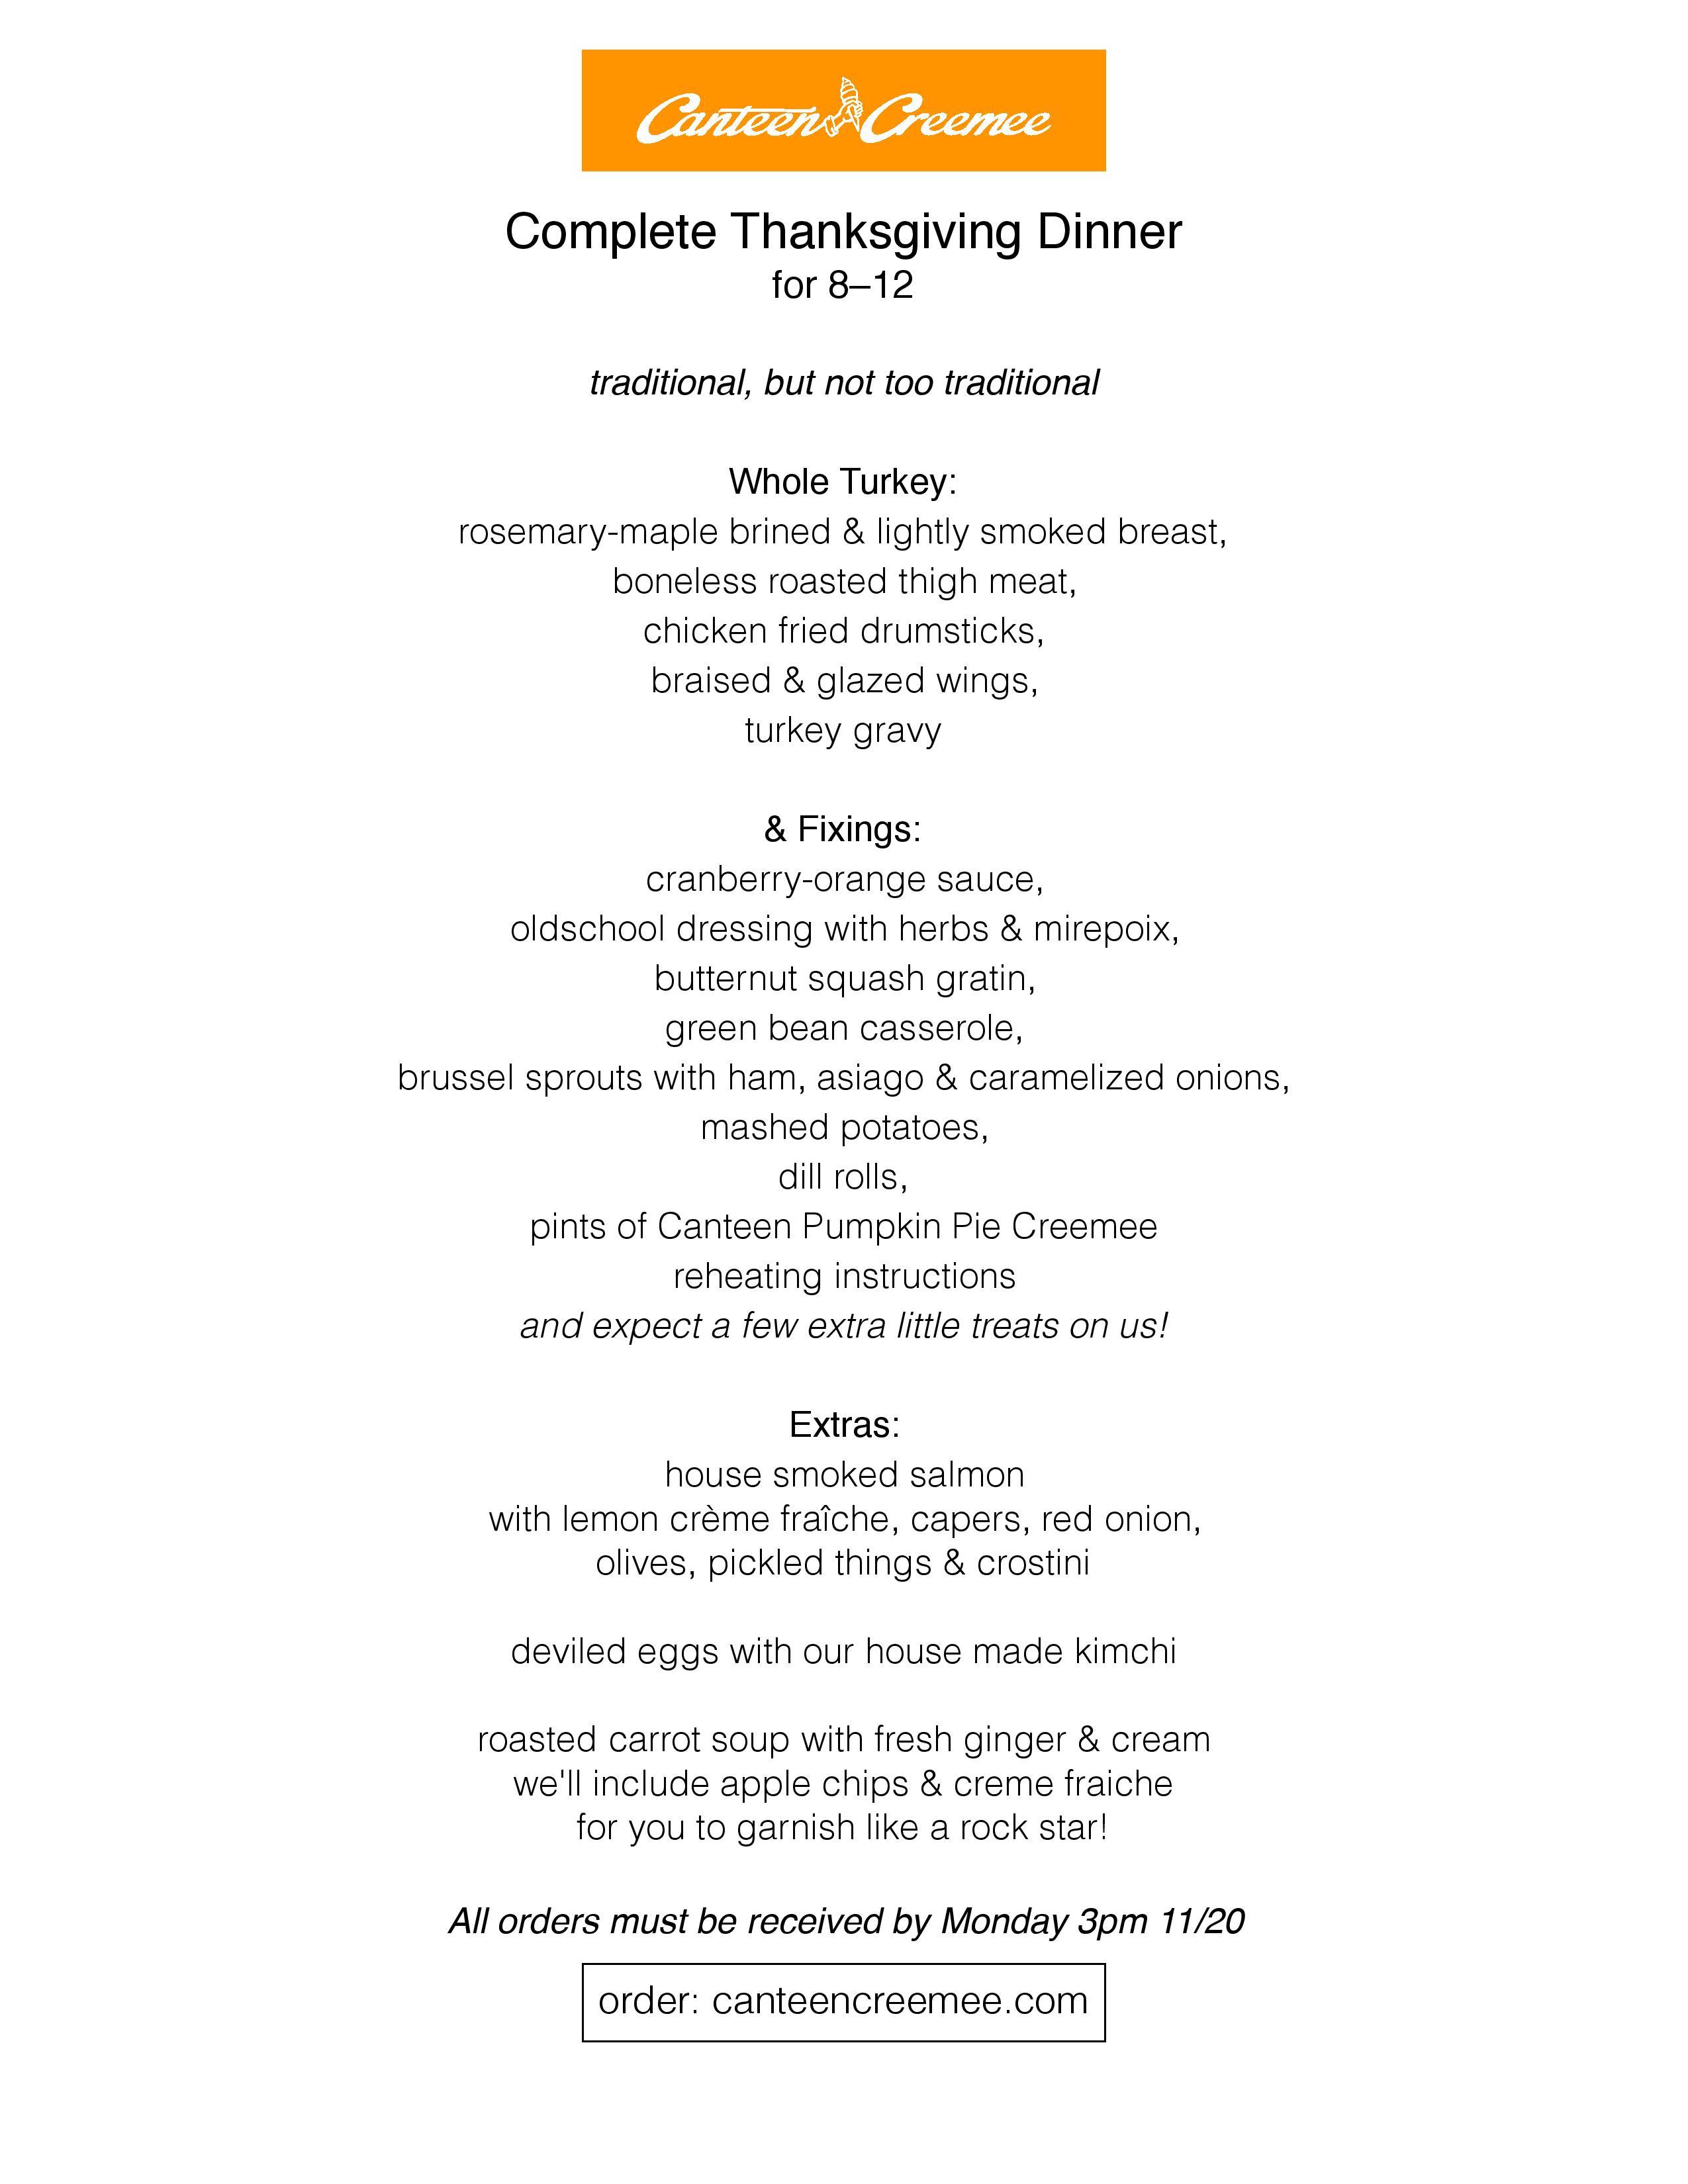 Canteen Creemee menu